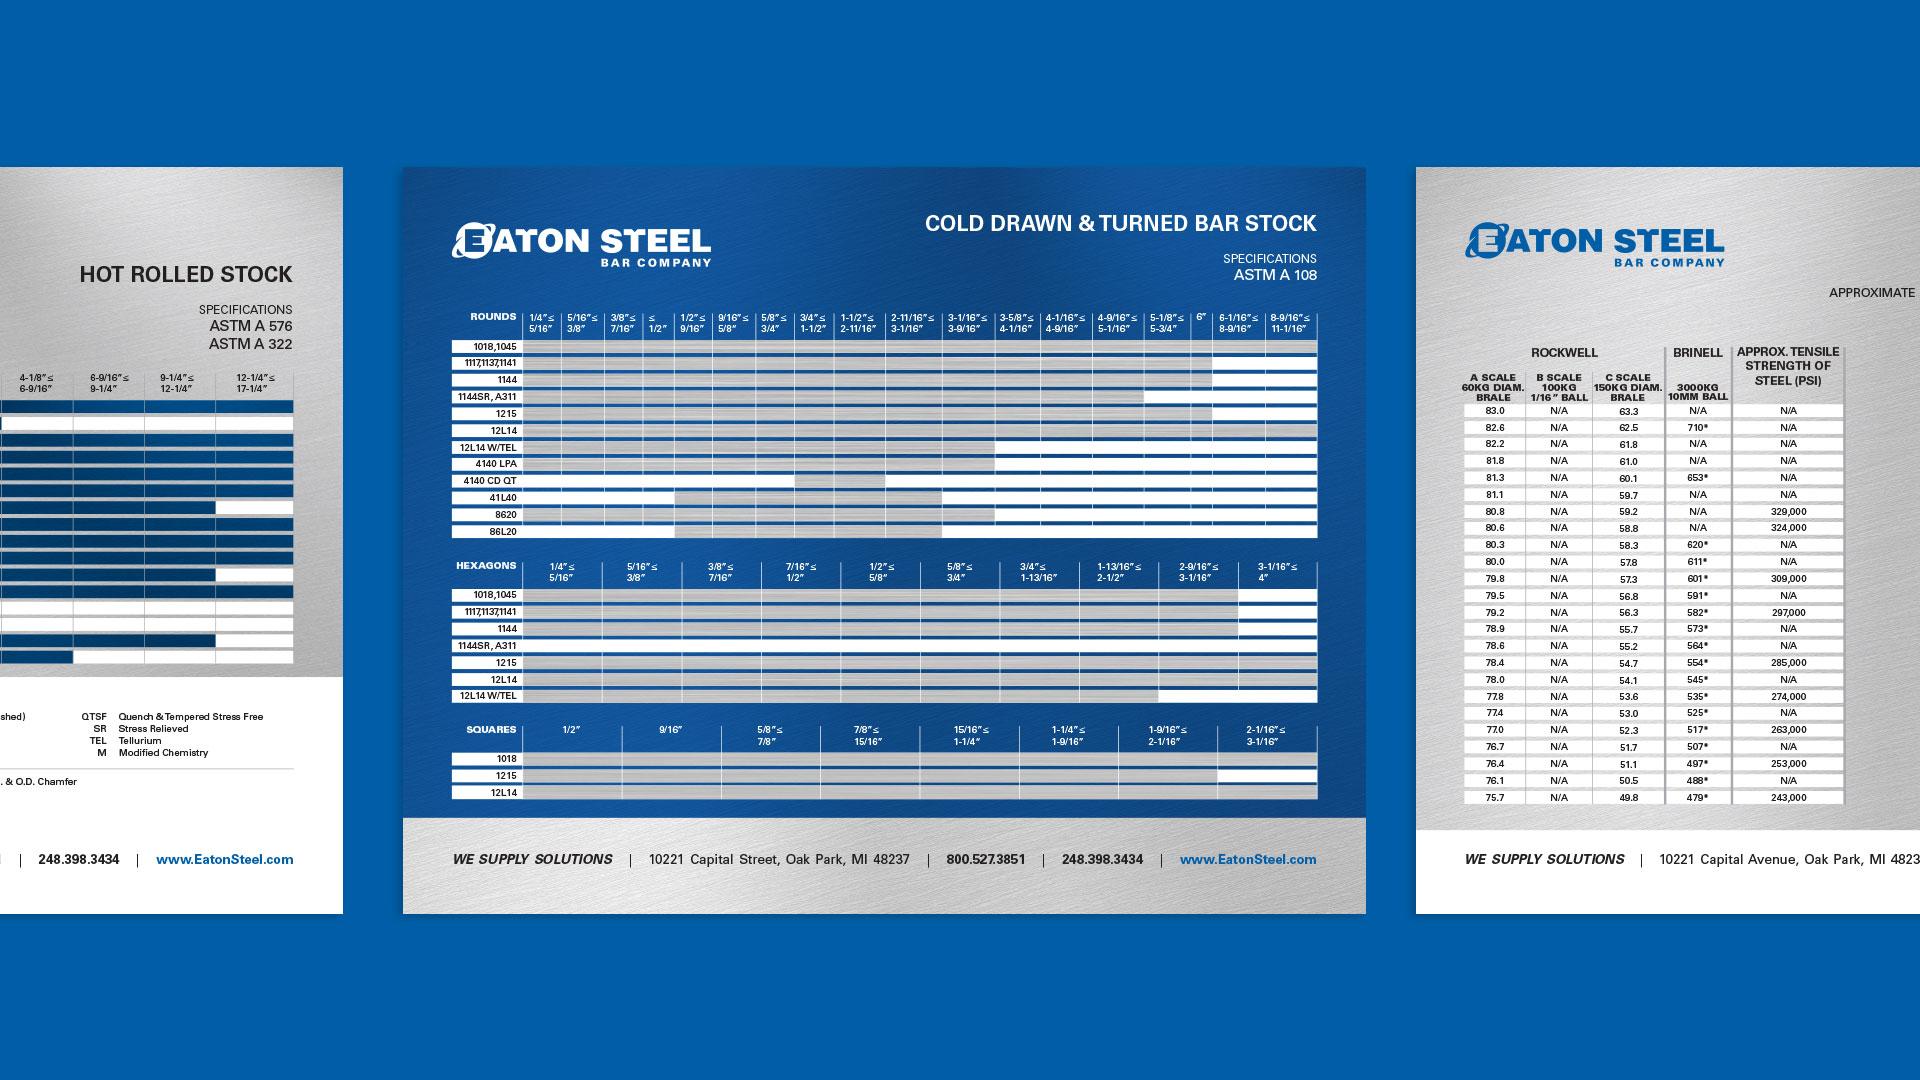 Eaton Steel Product Sell Sheet